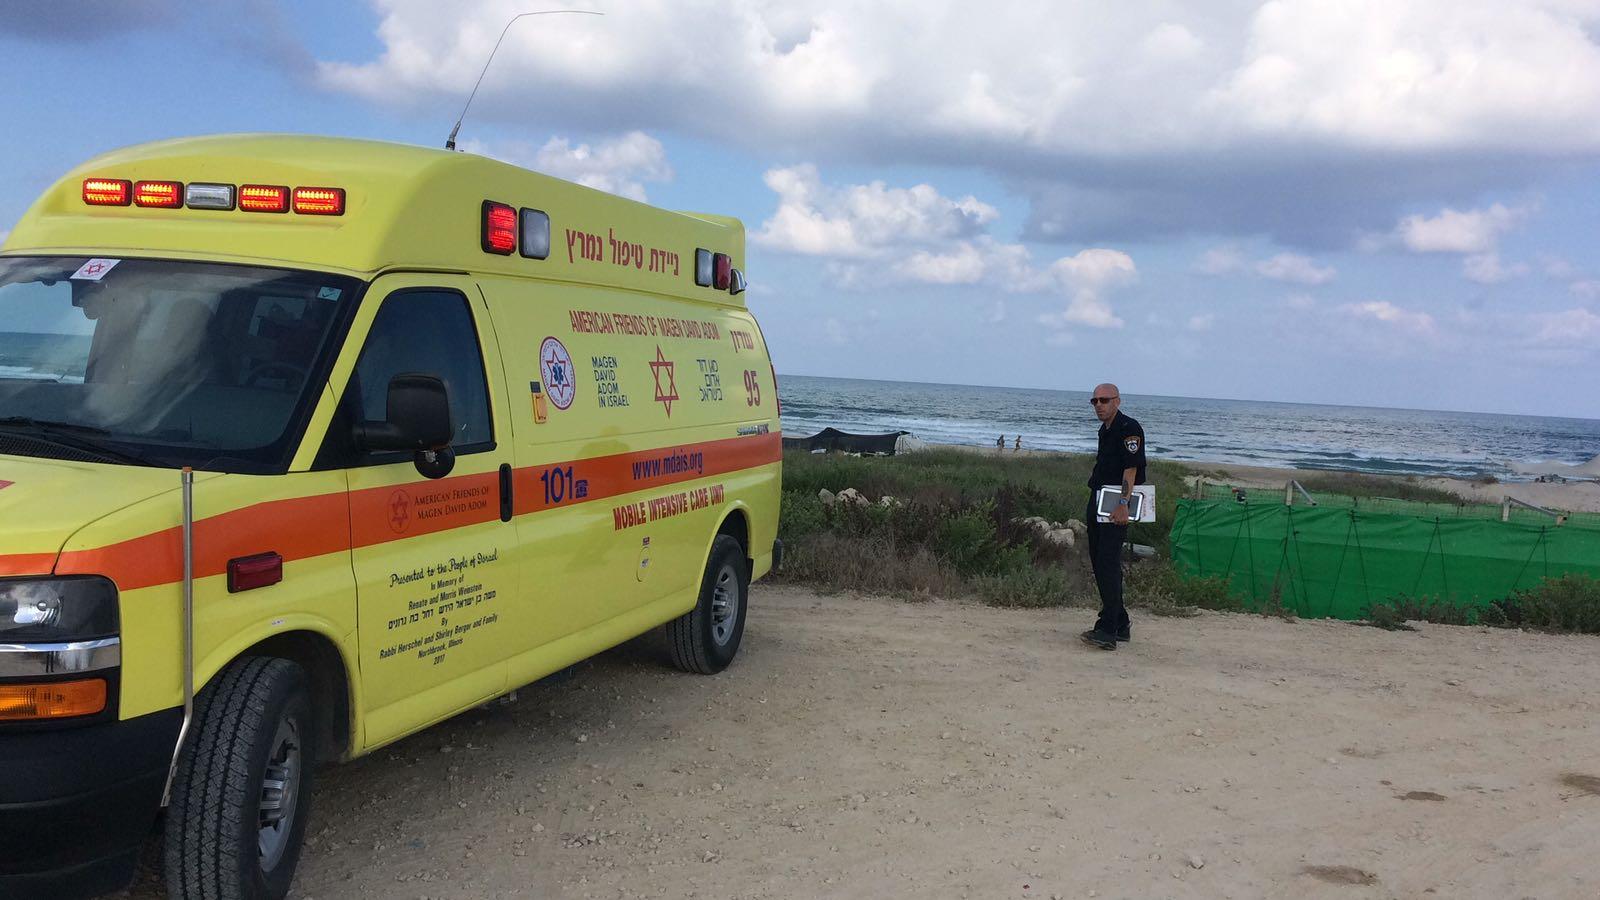 Photo of צפו: שוב טביעה בחוף לא מוכרז. צעיר בן 24 טבע למוות הבוקר בחוף הדרומי במעיין צבי